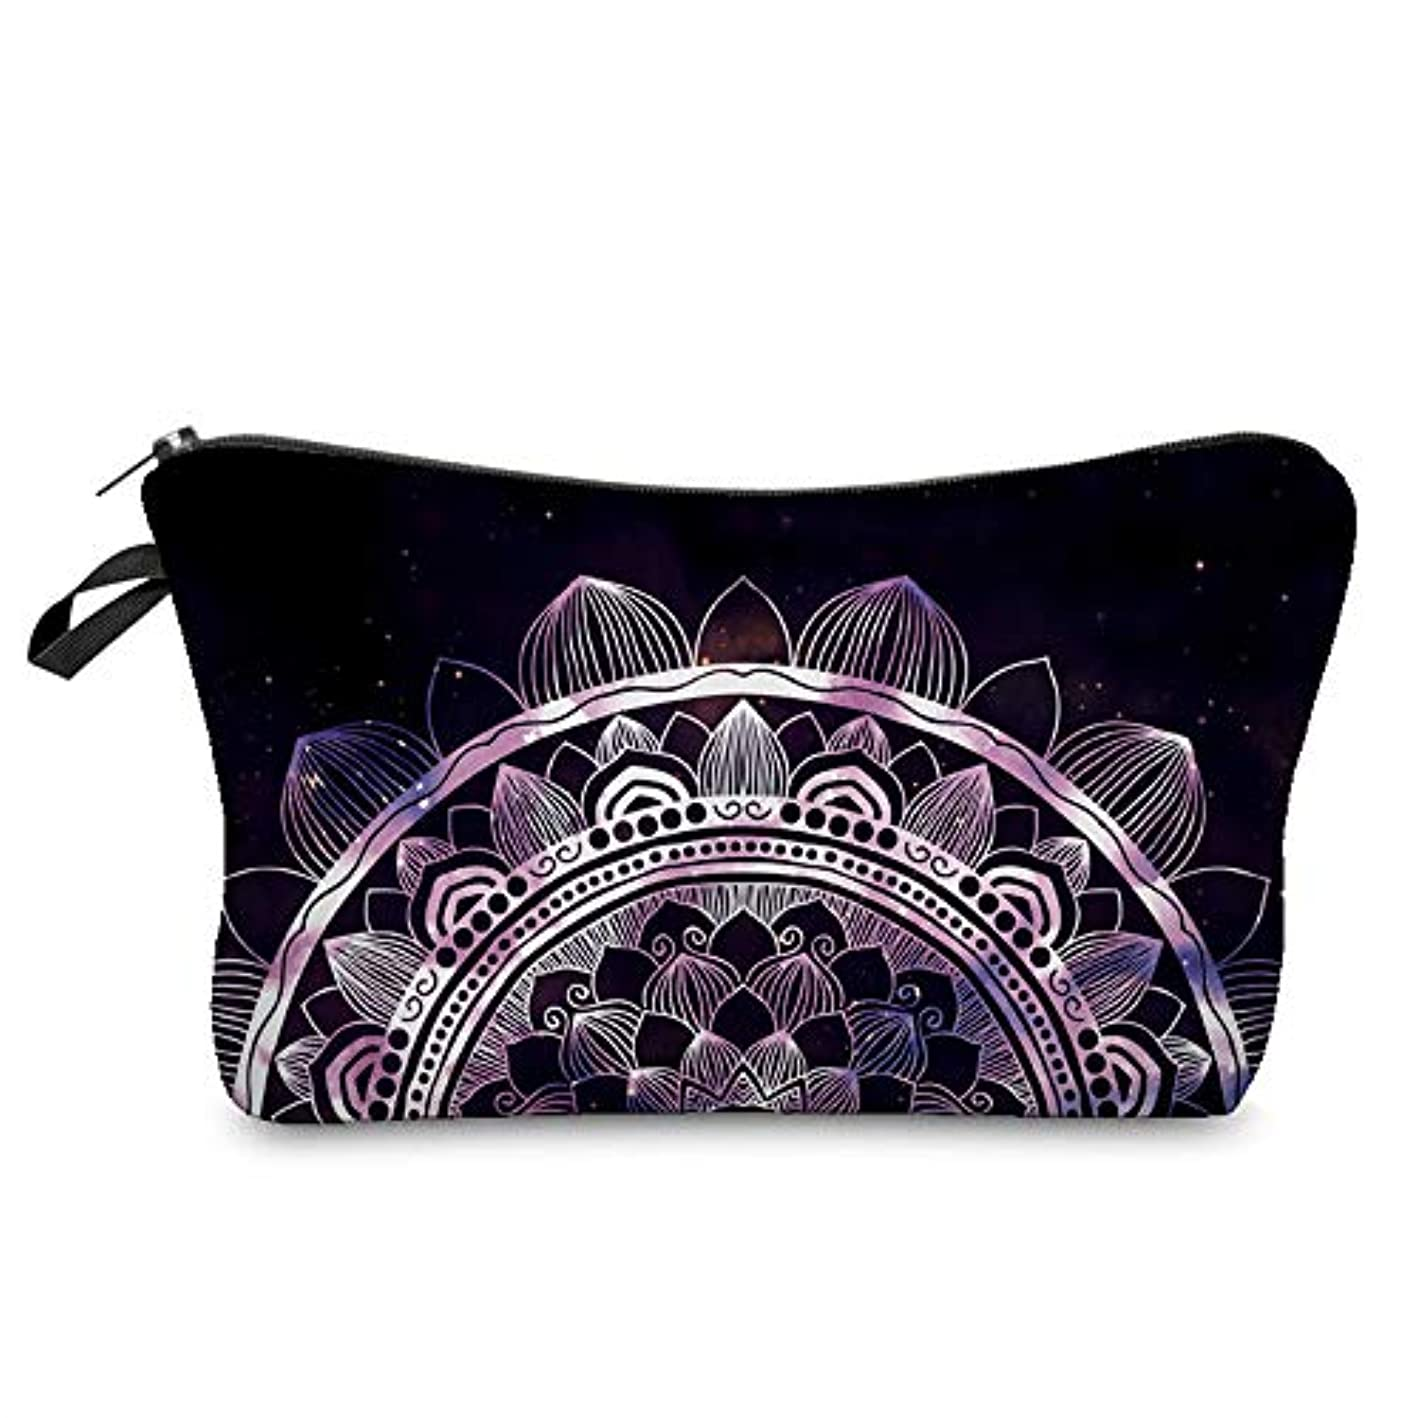 1st market 優れた3D曼荼羅印刷化粧品オーガナイザーバッグ女性旅行化粧ポーチ